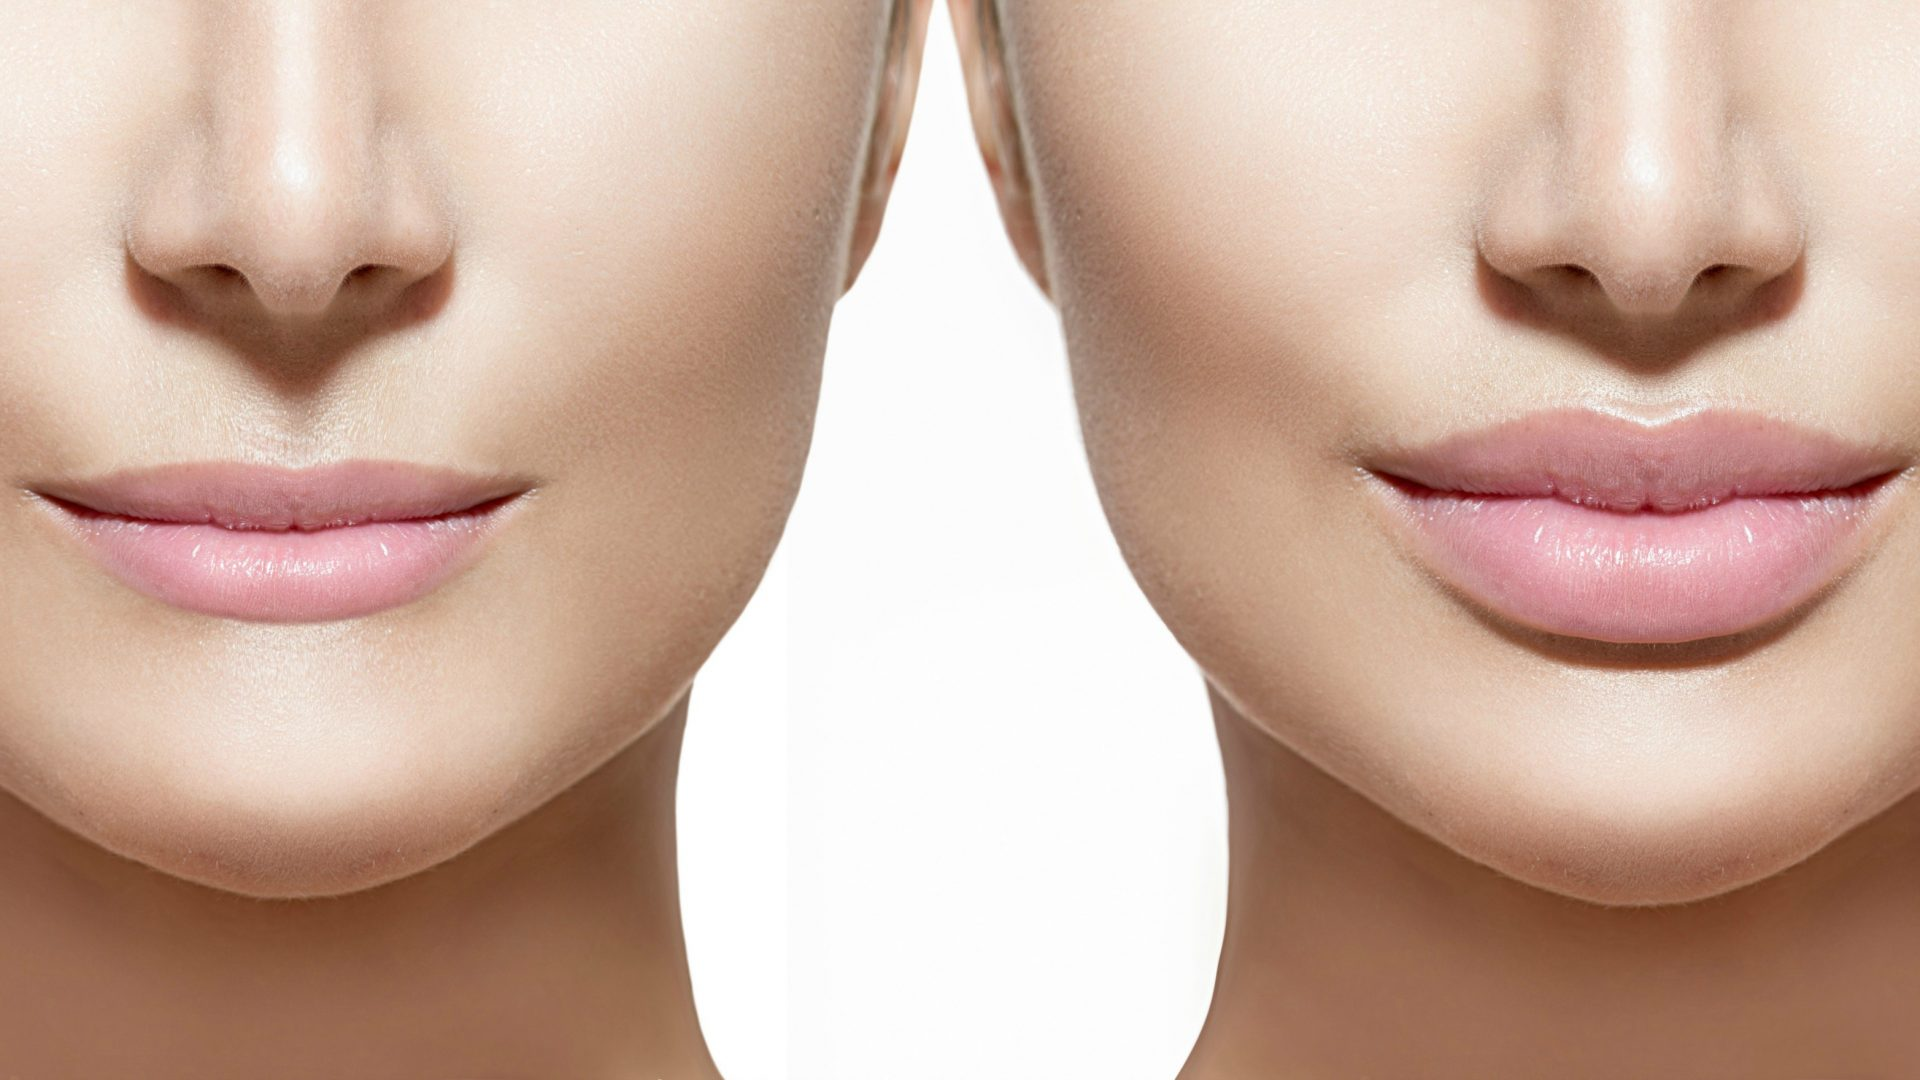 Lip Augmentation and Benefits